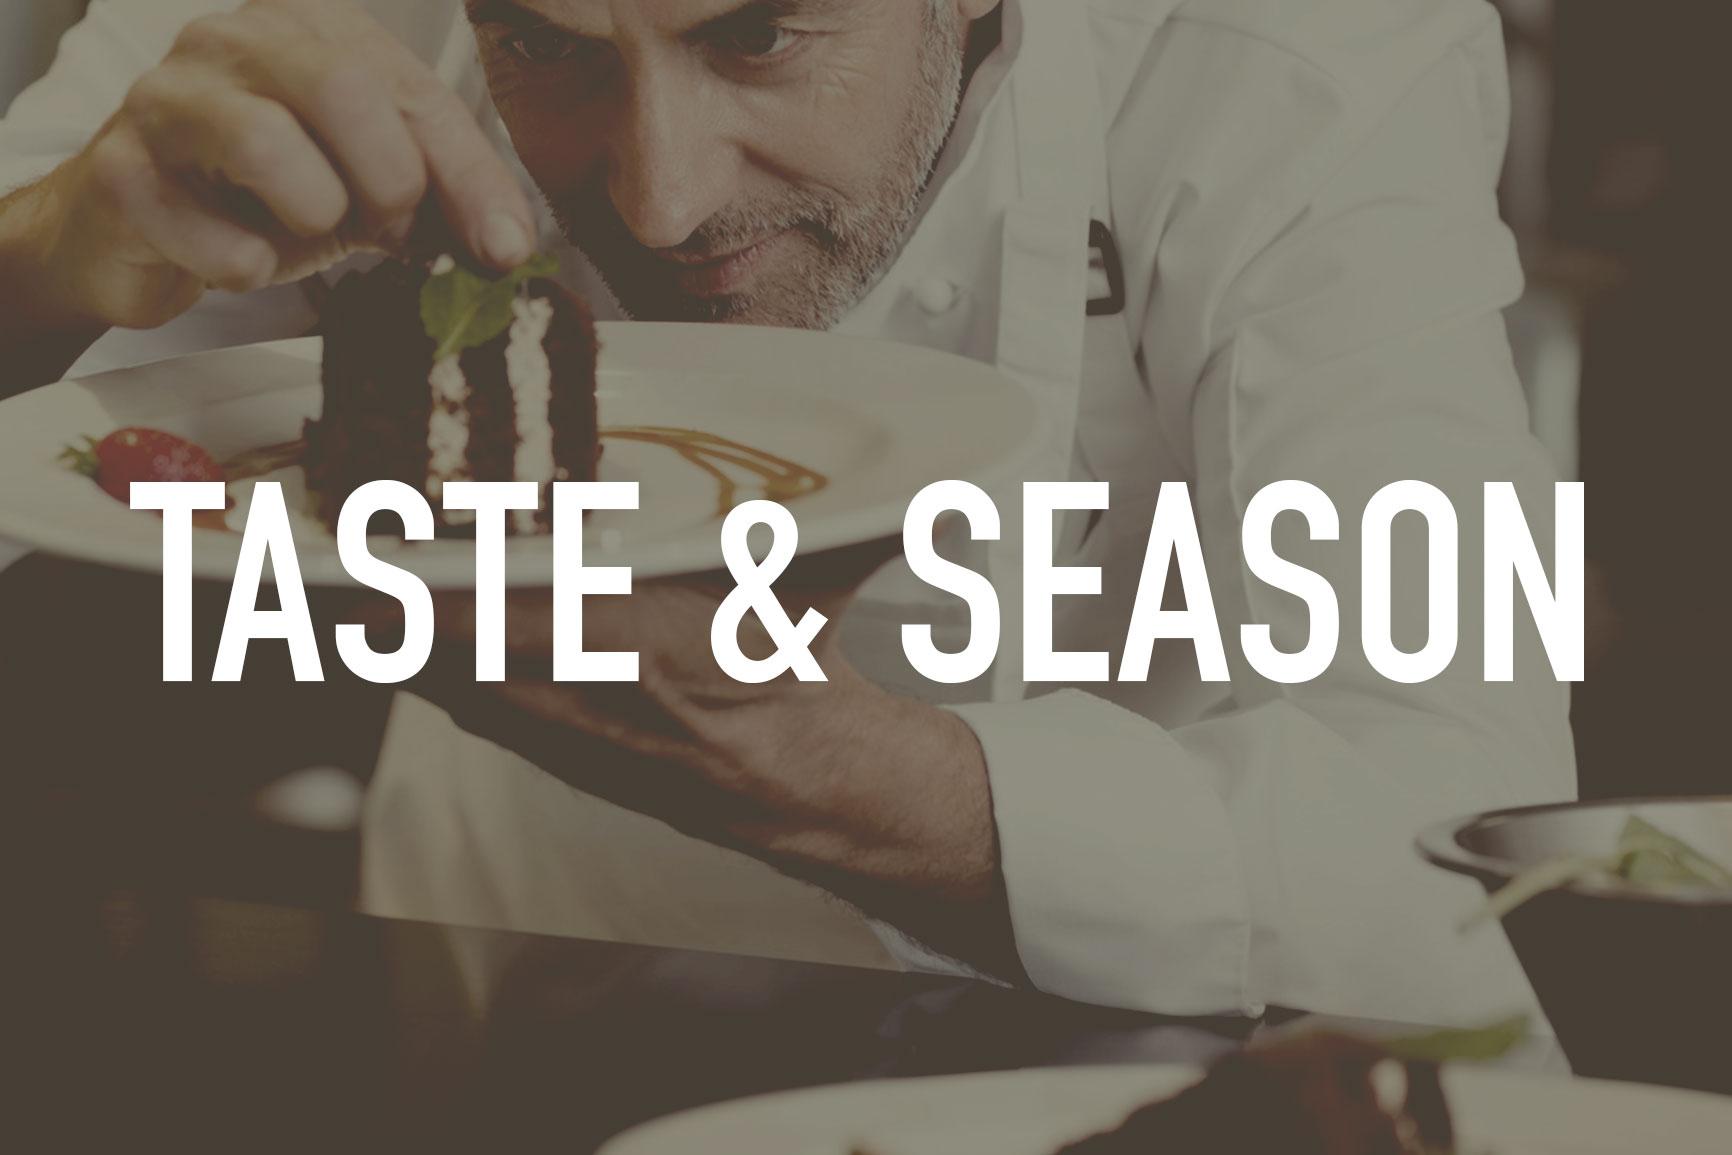 taste-season.jpg